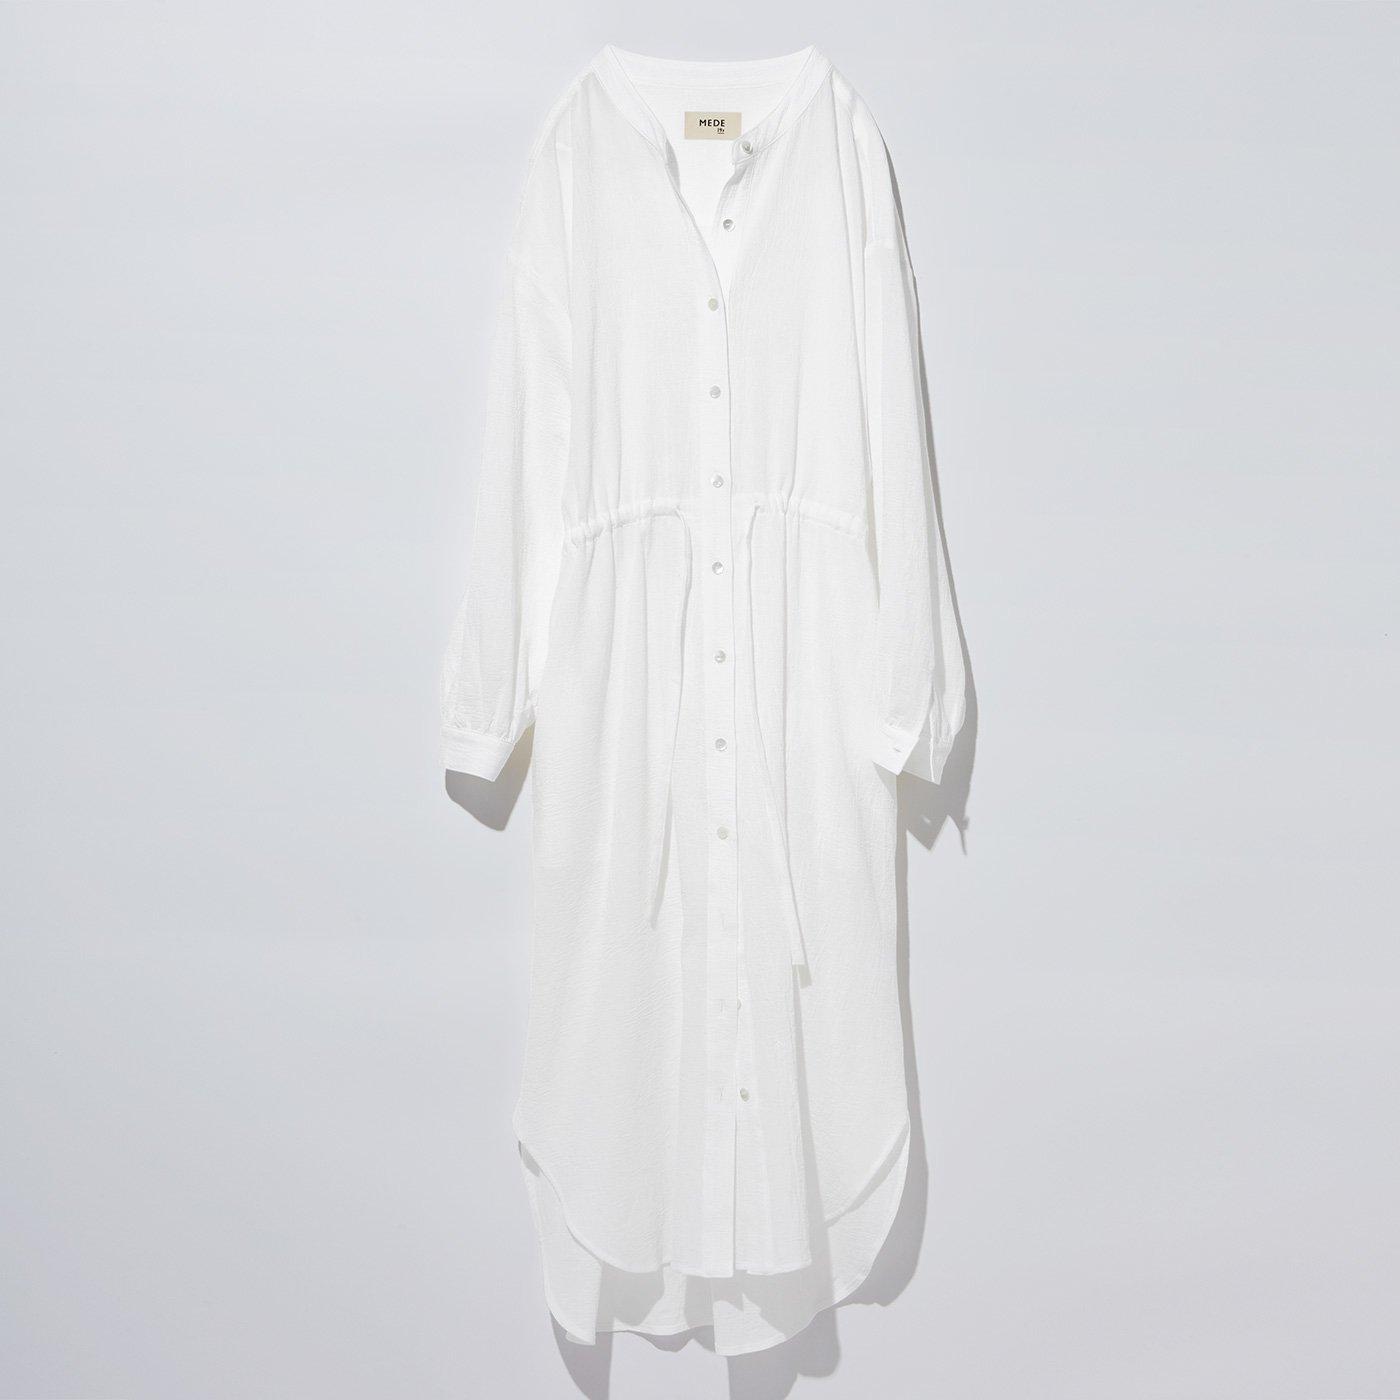 MEDE19F コットンガーゼ羽織りワンピース〈ホワイト〉